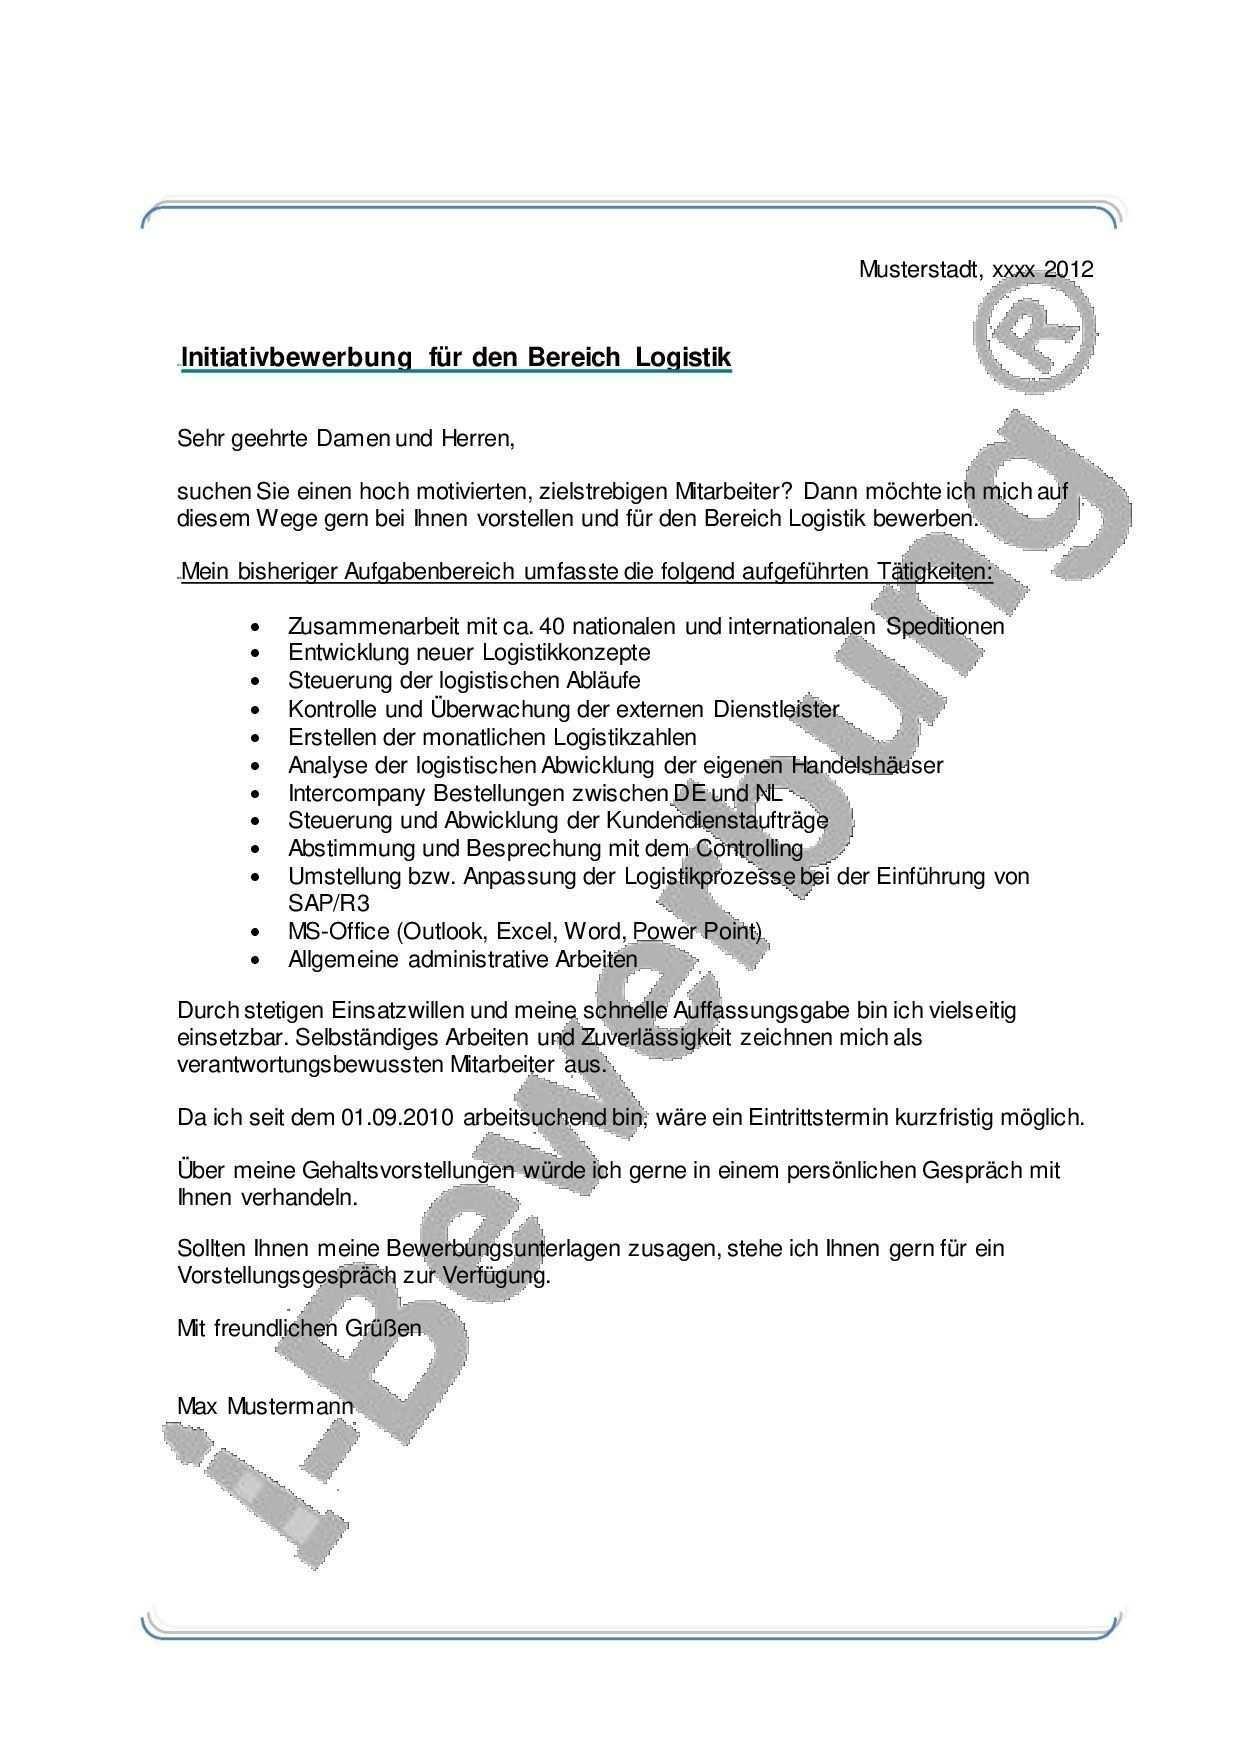 Muster Anschreiben Zur Initiativbewerbung Bereich Bewerbung Logistik Muster Anschreiben Initiativbewerbung Bereich Beispiel Zur Bewerbung In 2020 Sheet Music Job